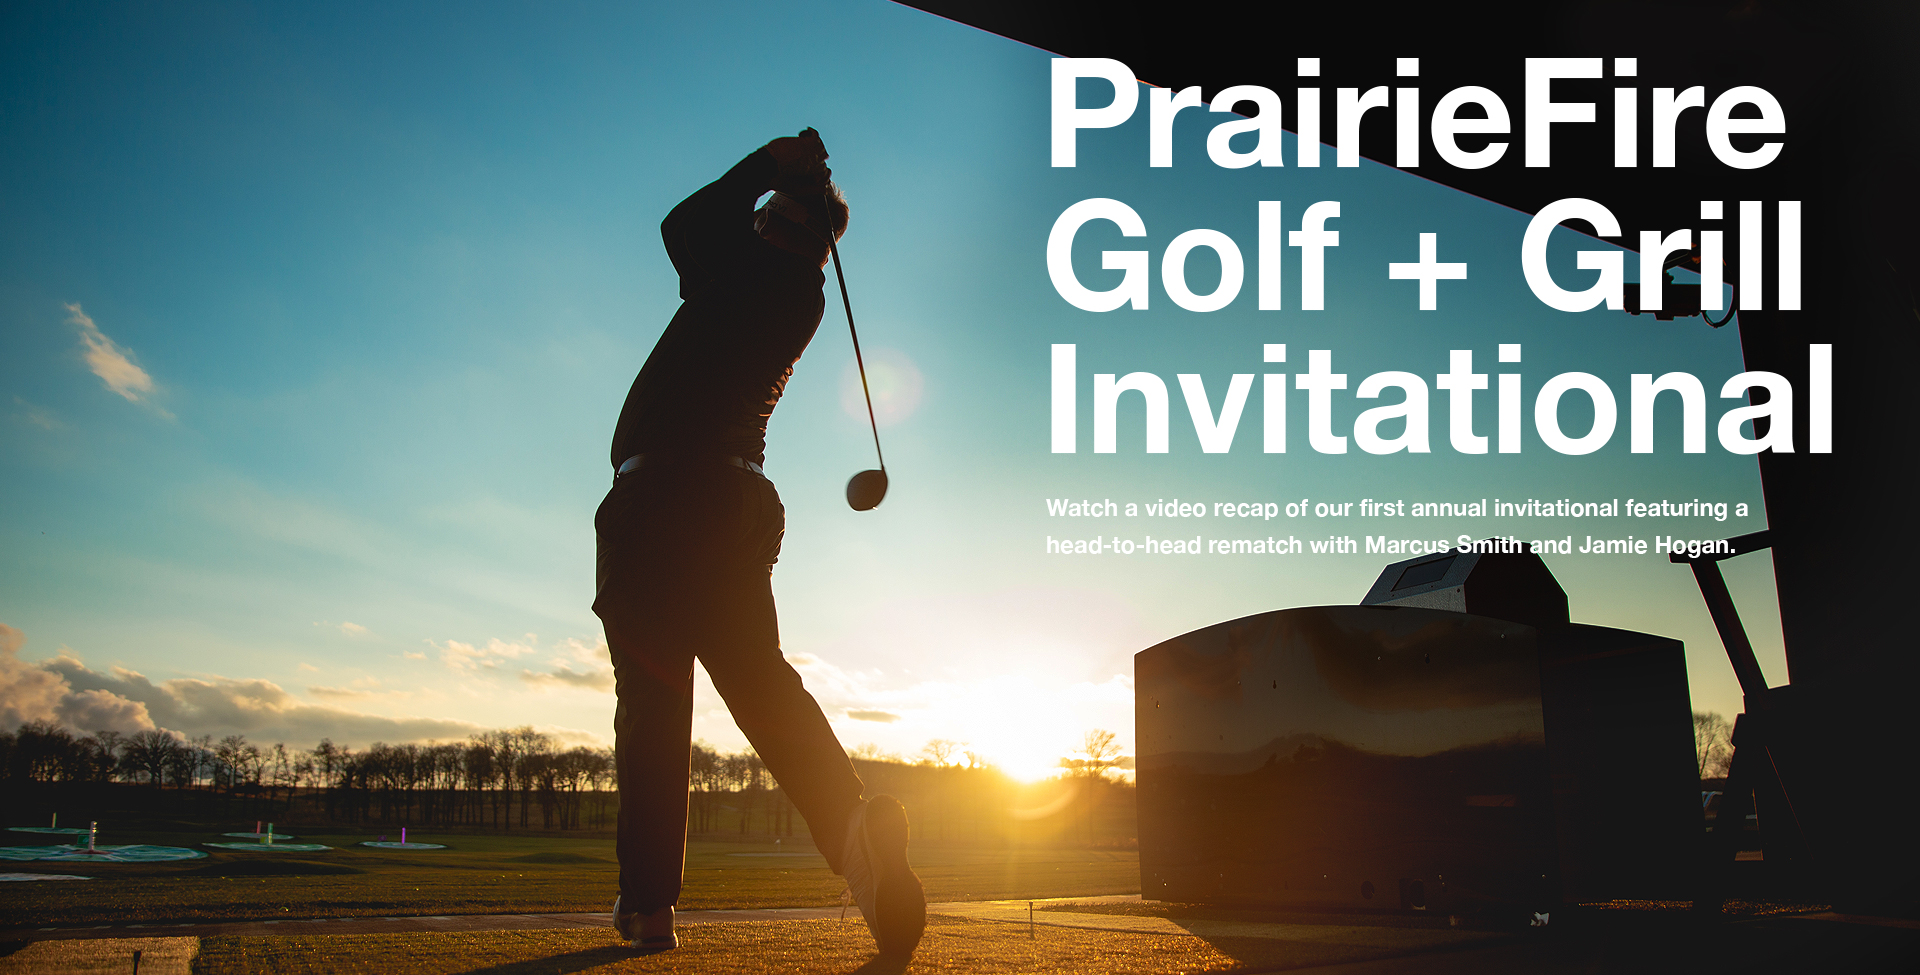 PrairieFire Invitational